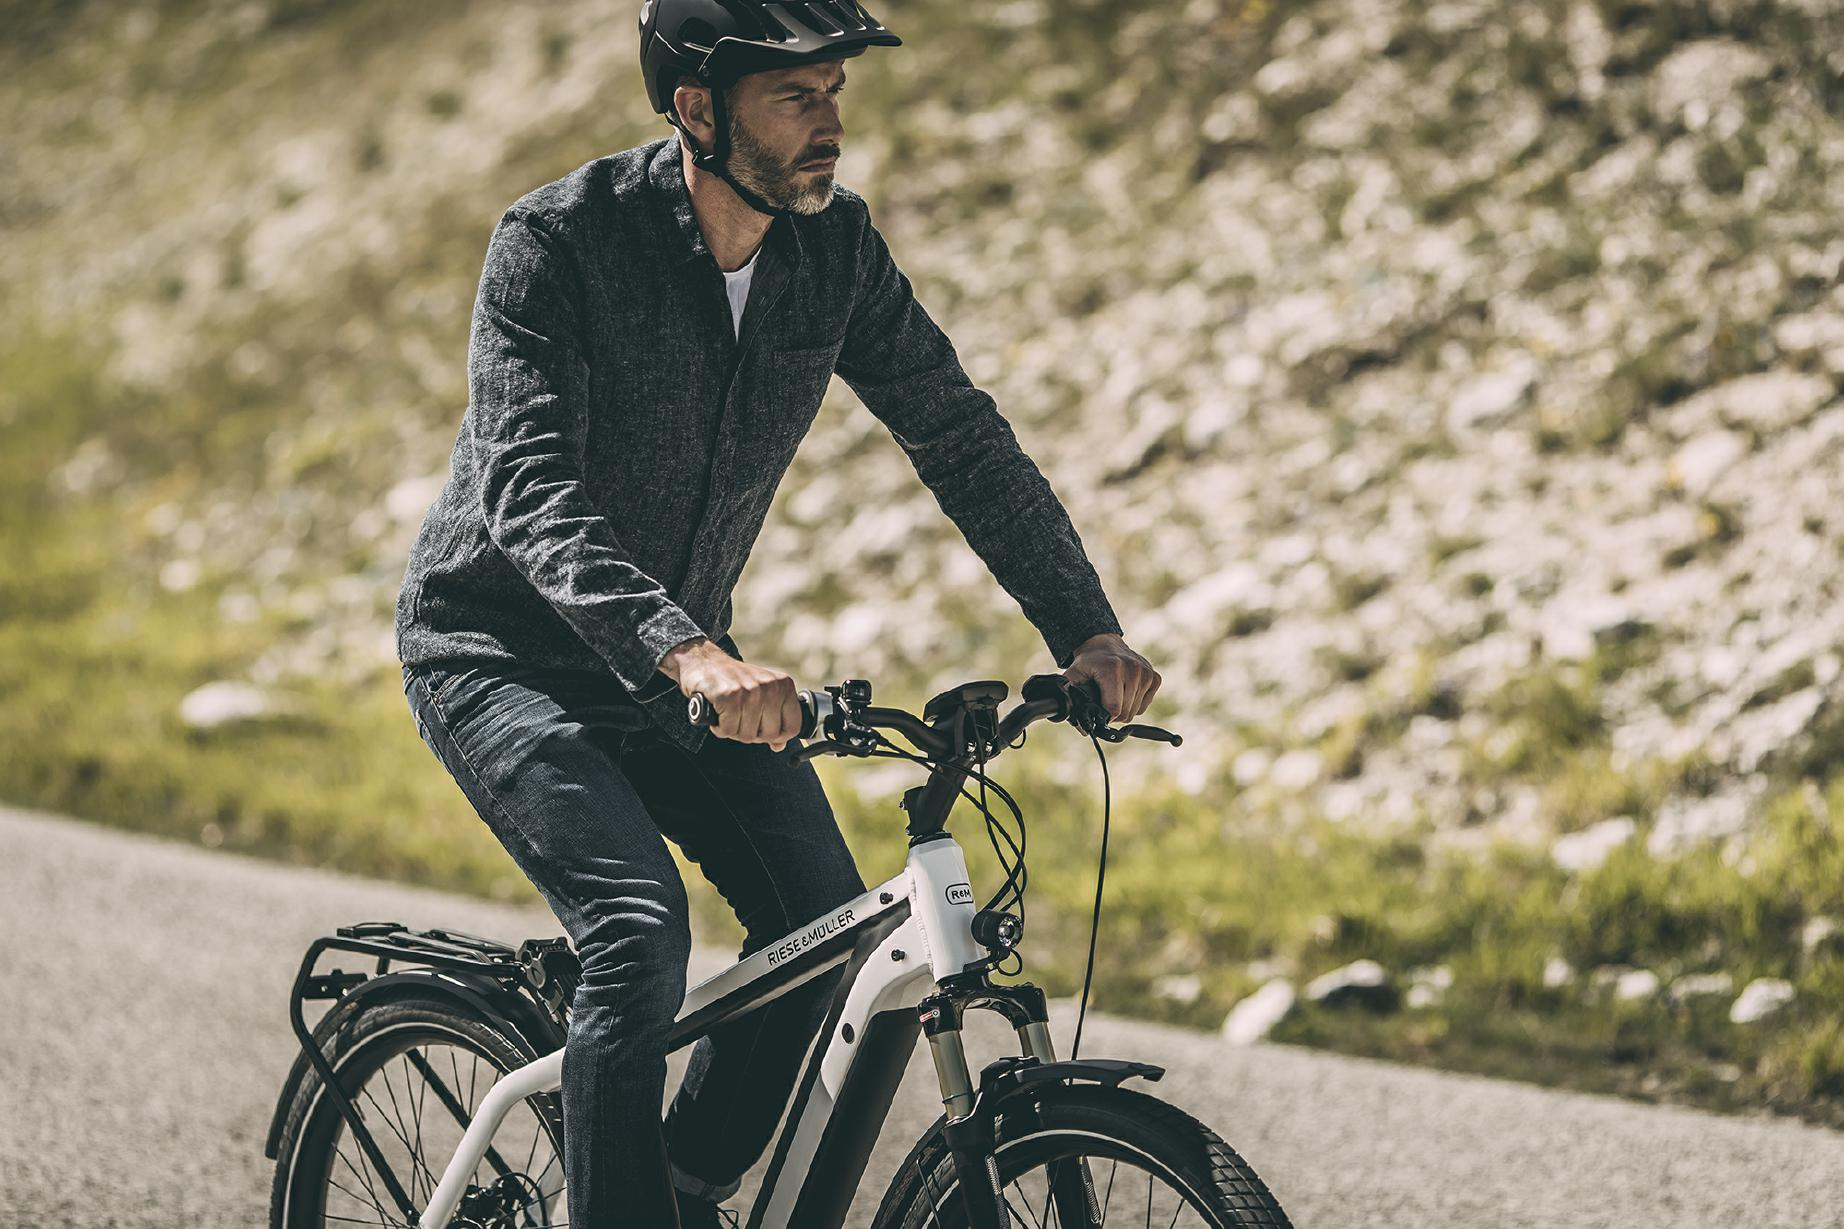 riese und m ller new charger trekking e bike speed pedelec 2018 e motion e bikes. Black Bedroom Furniture Sets. Home Design Ideas